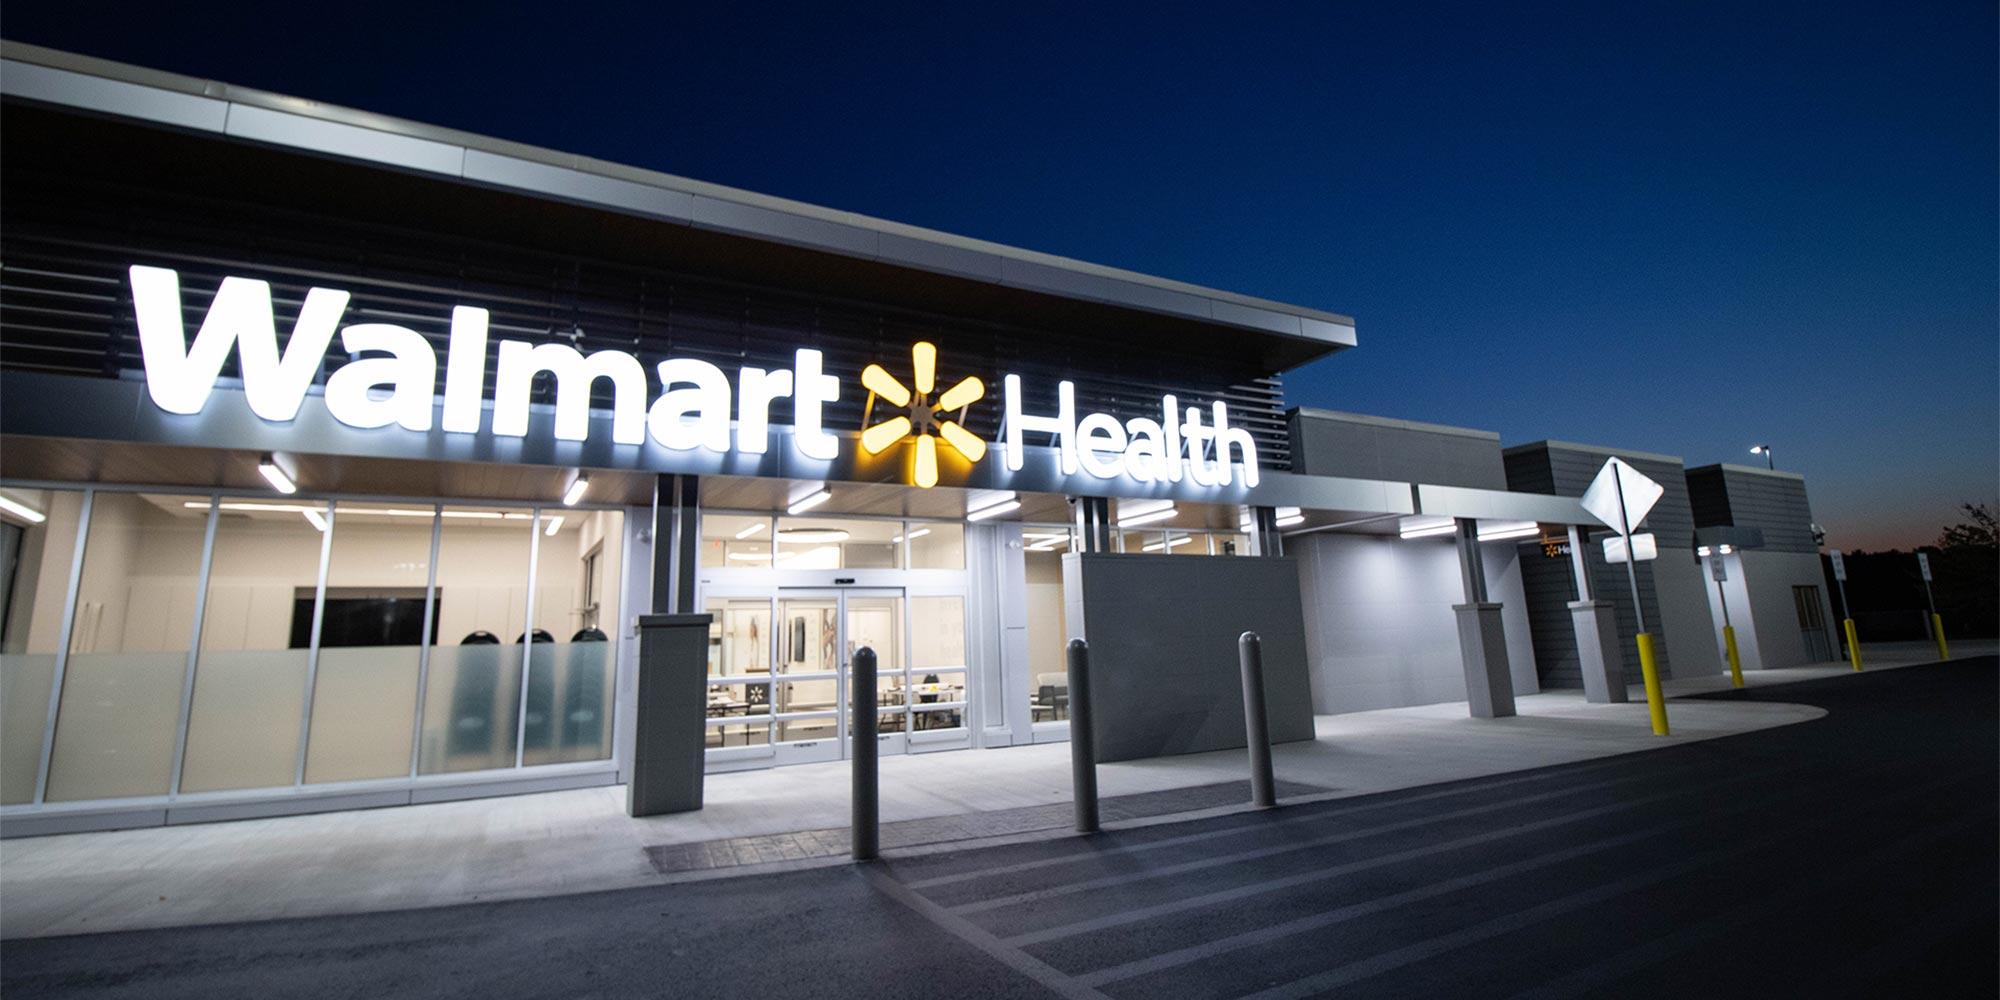 Walmart verkauft bald auch Versicherungen